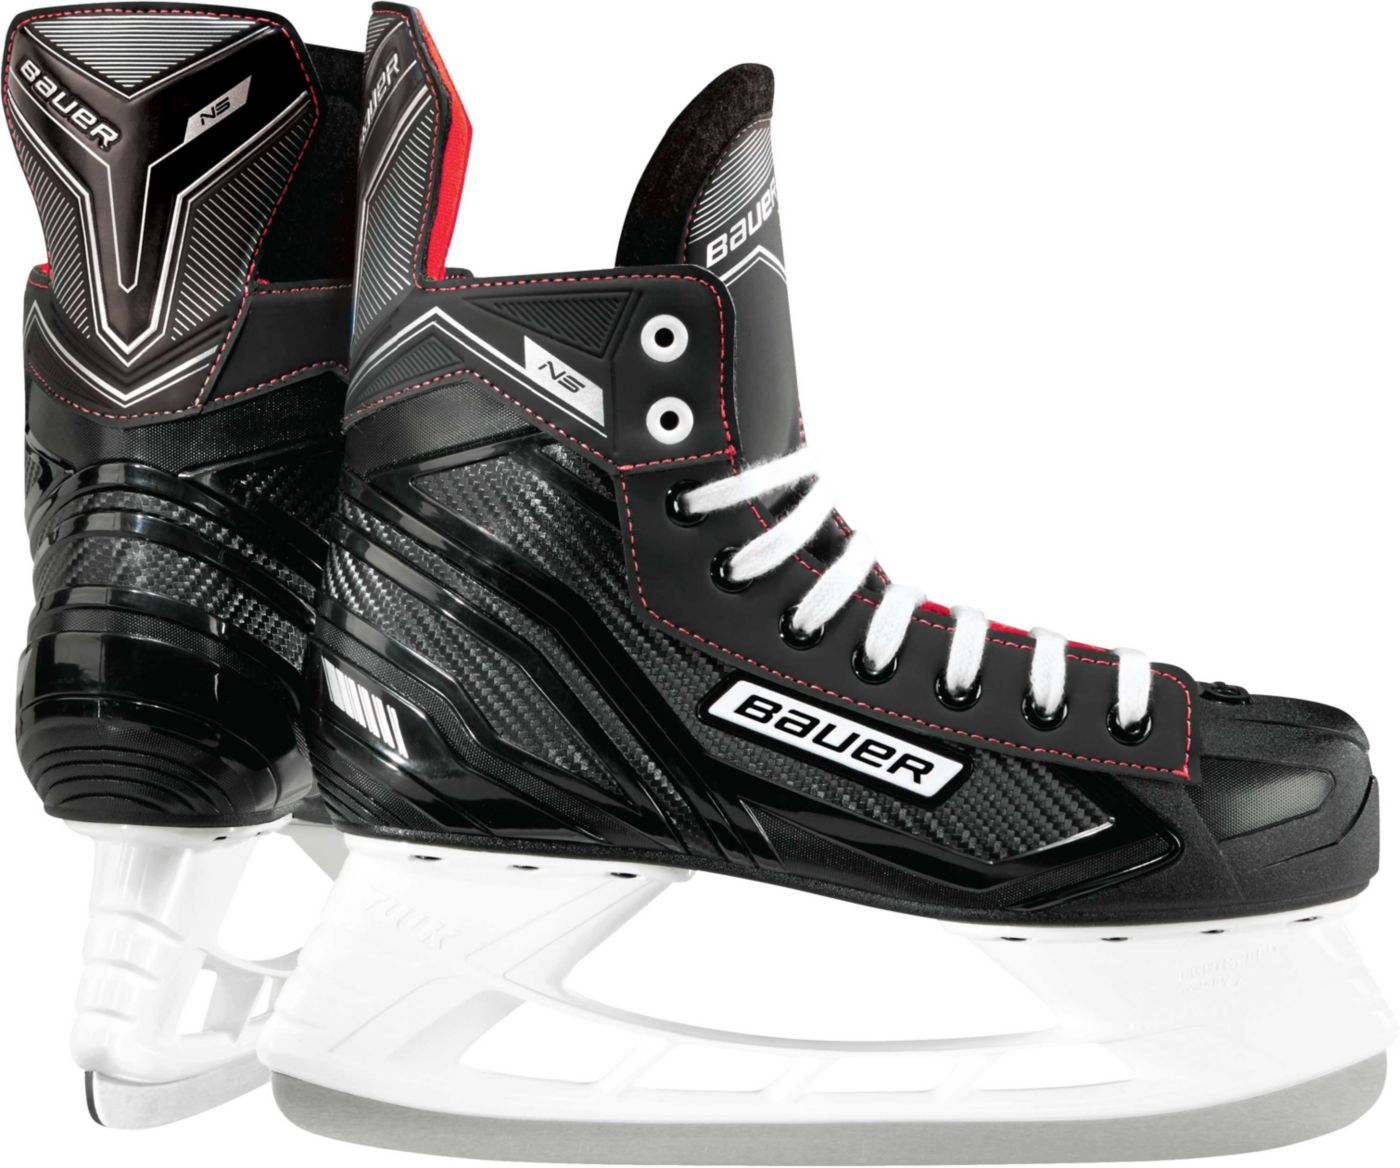 Bauer Youth NS Ice Hockey Skates